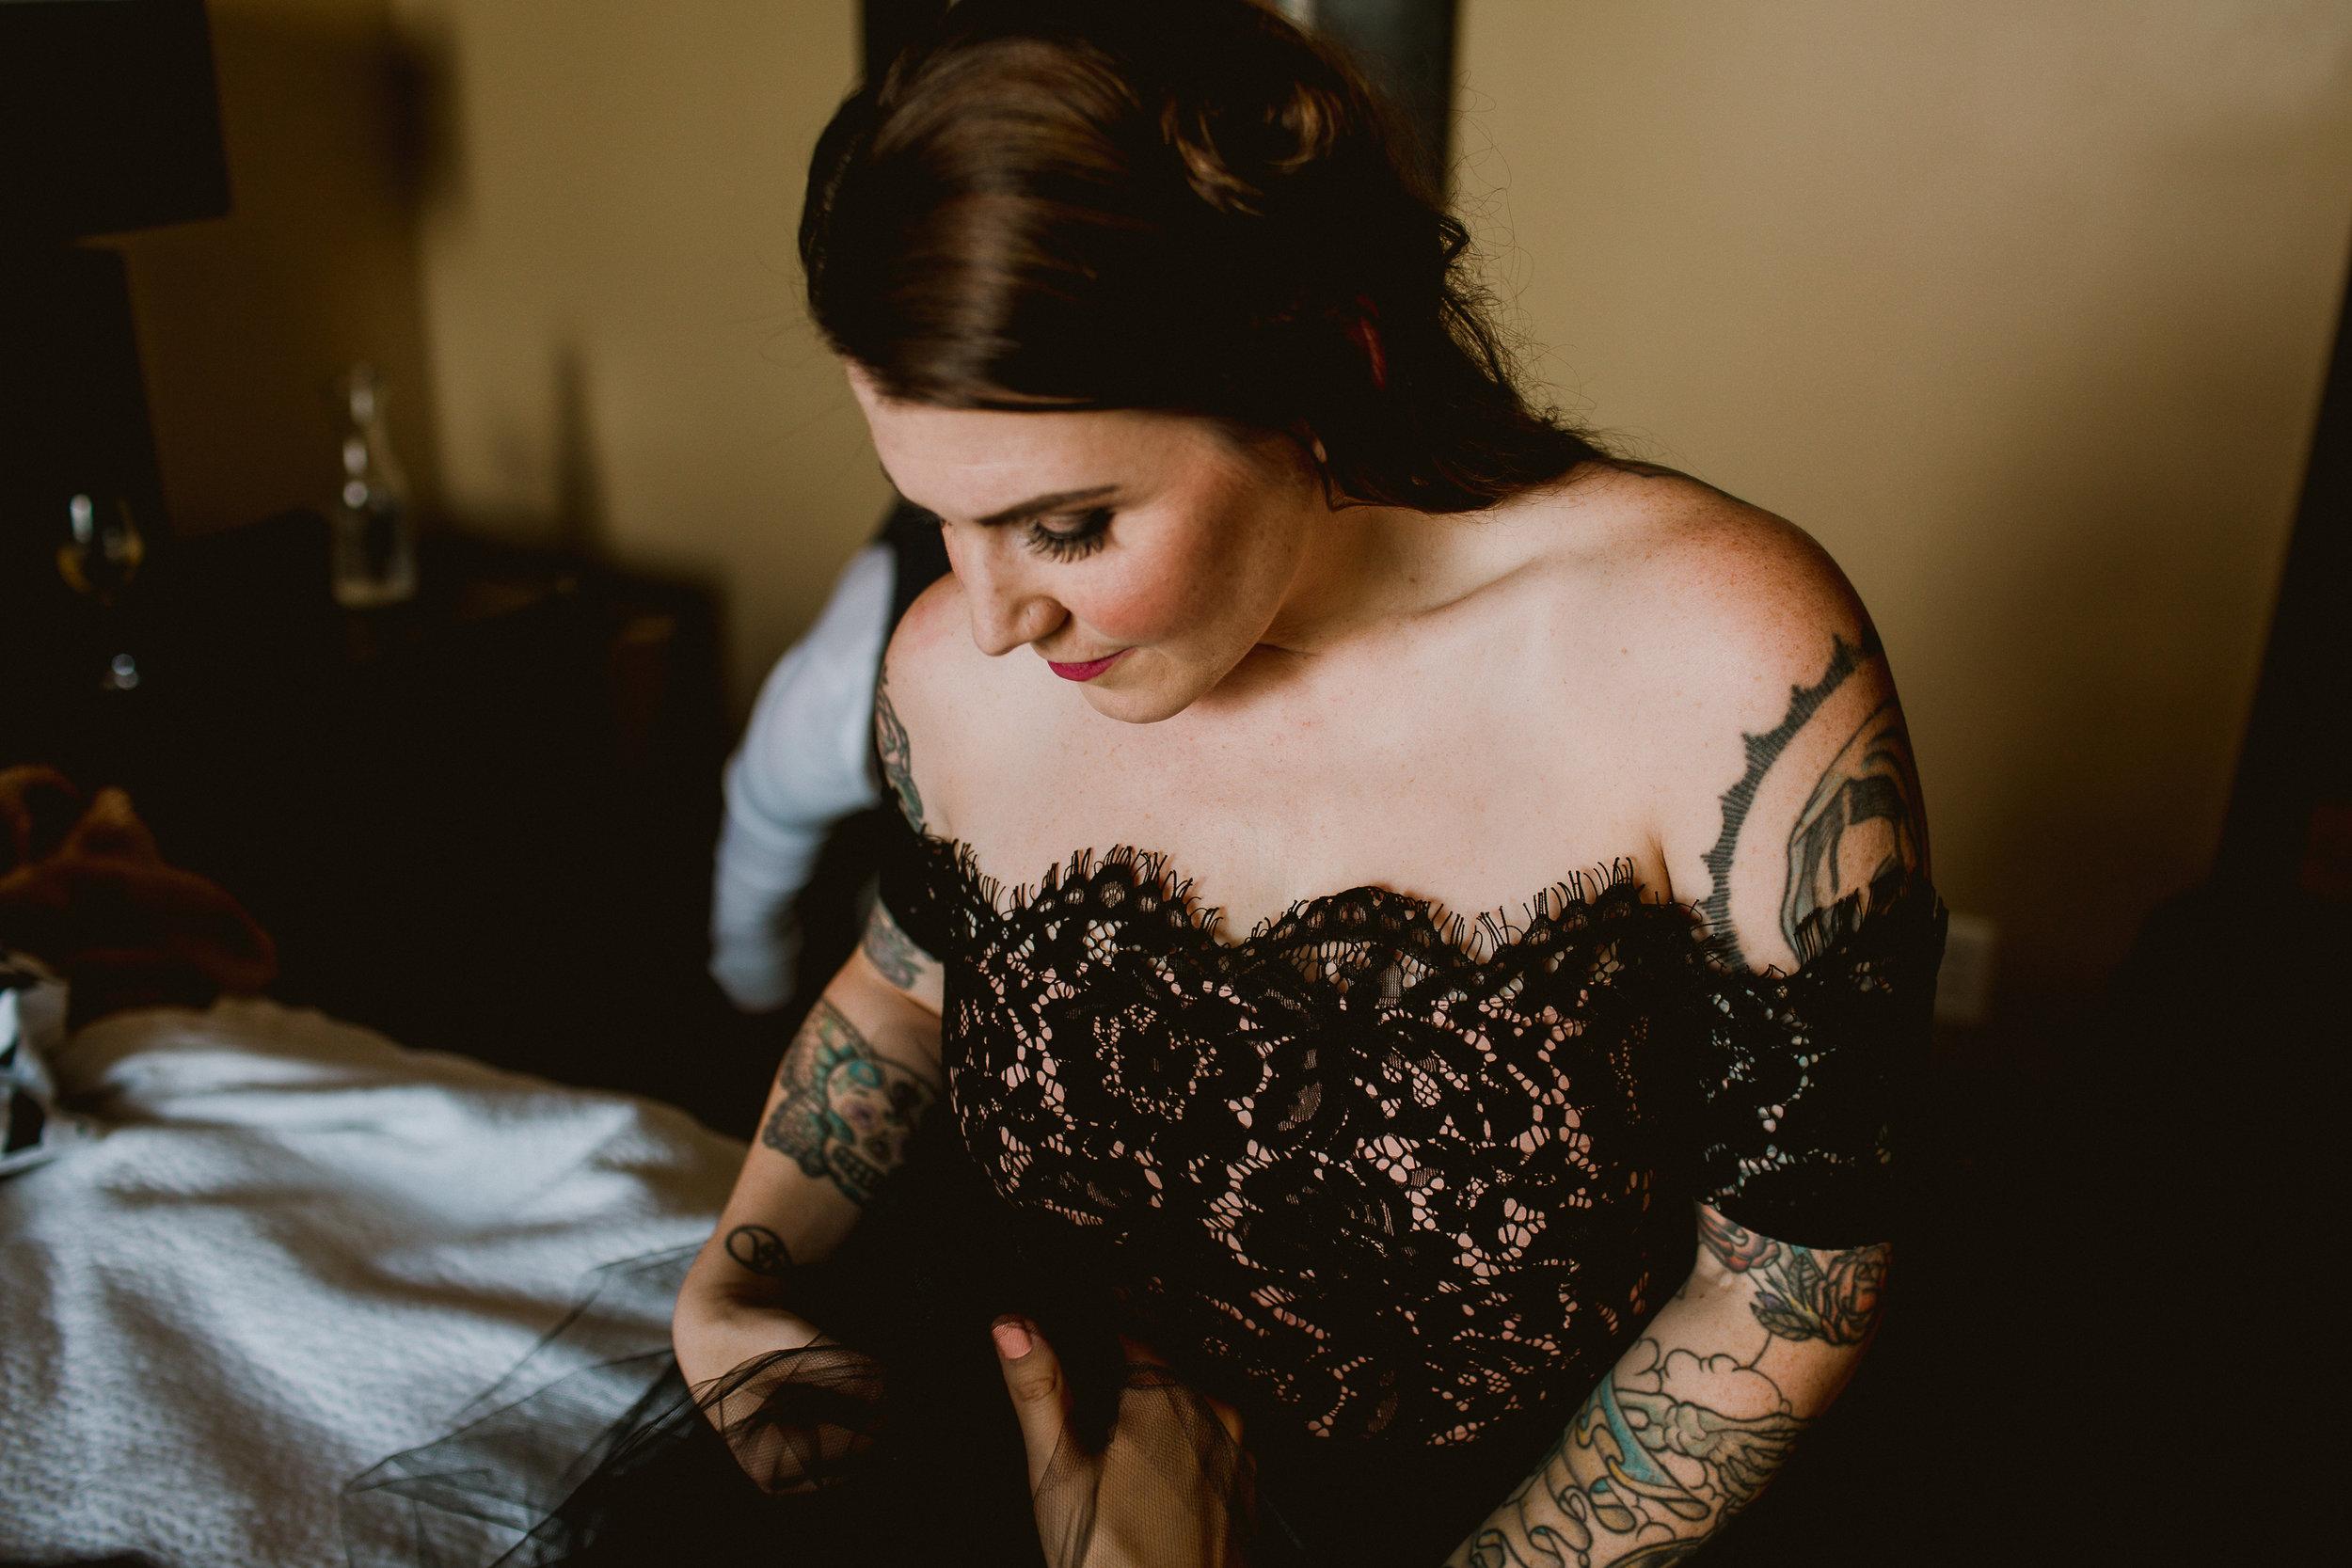 bohemian-hotel-savannah-elopement-kelley-raye-atlanta-wedding-photographer-32.jpg